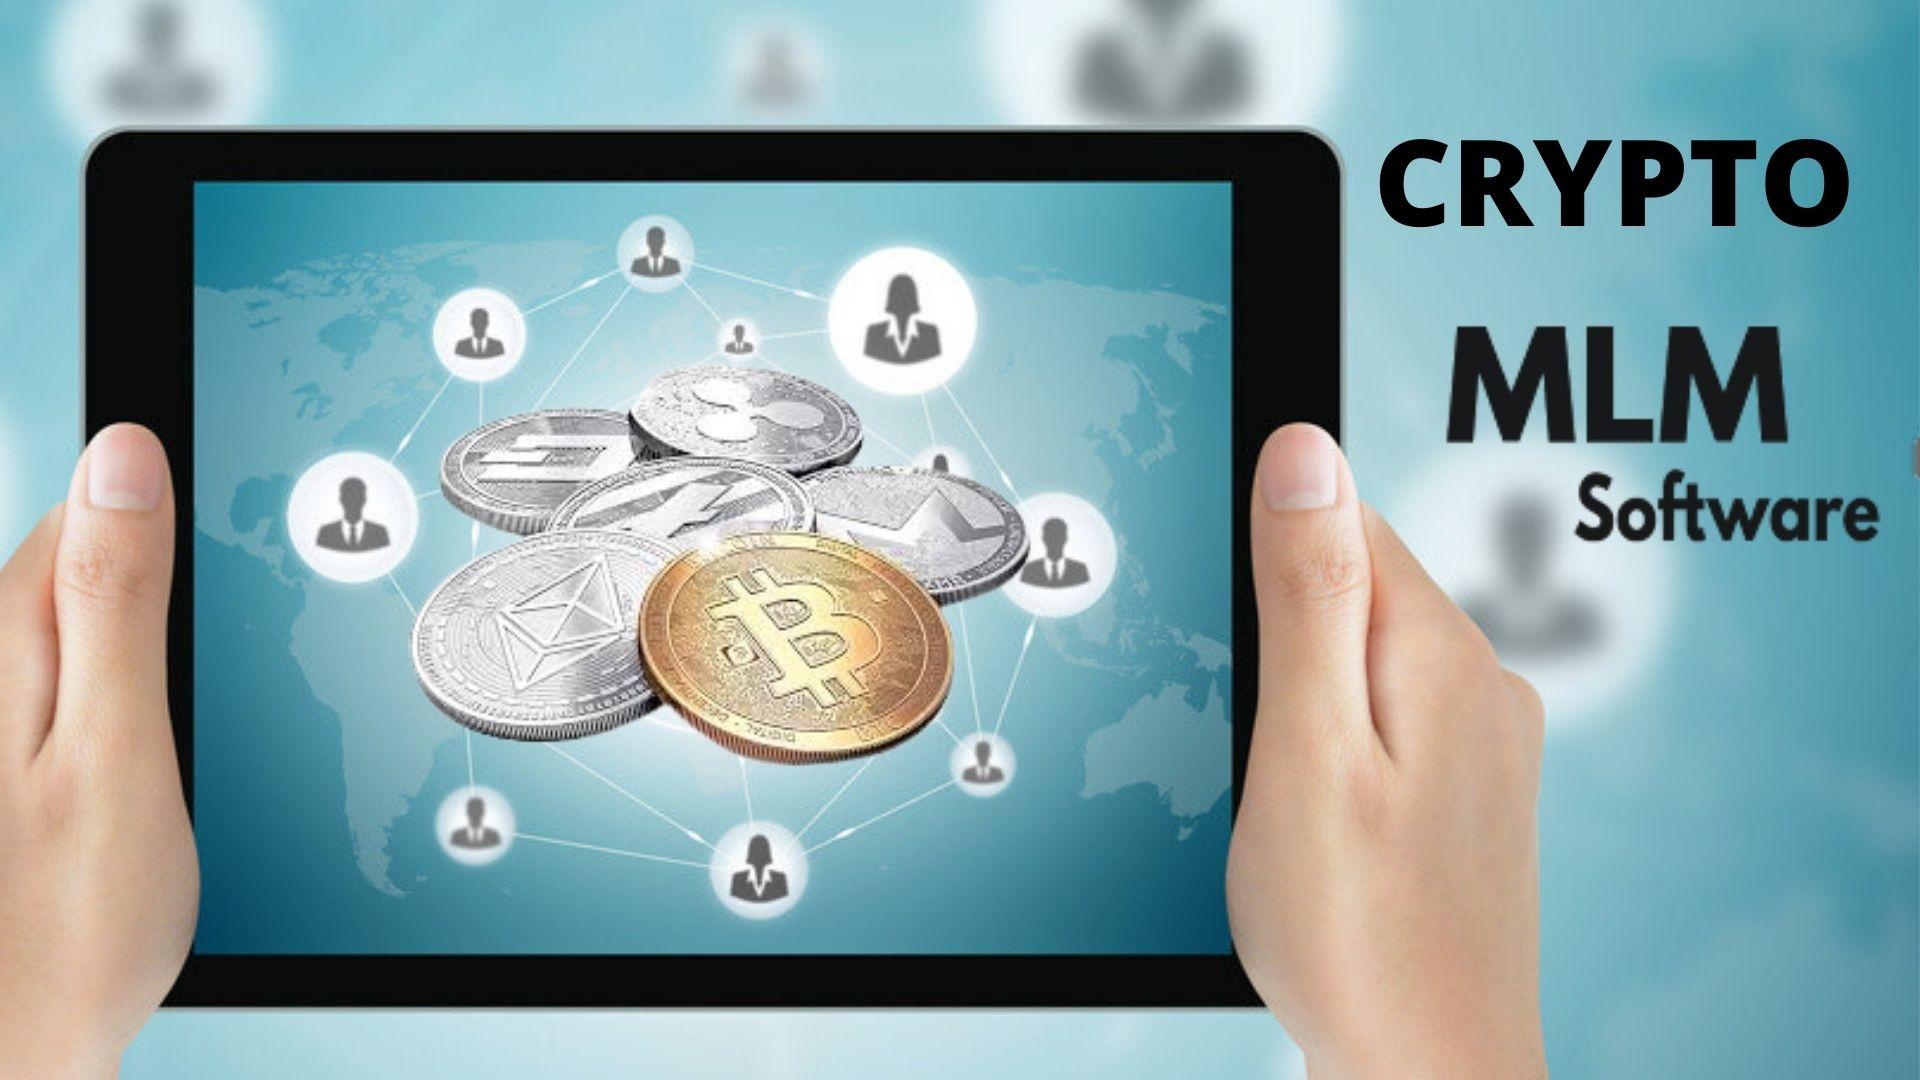 Crypto MLM Software